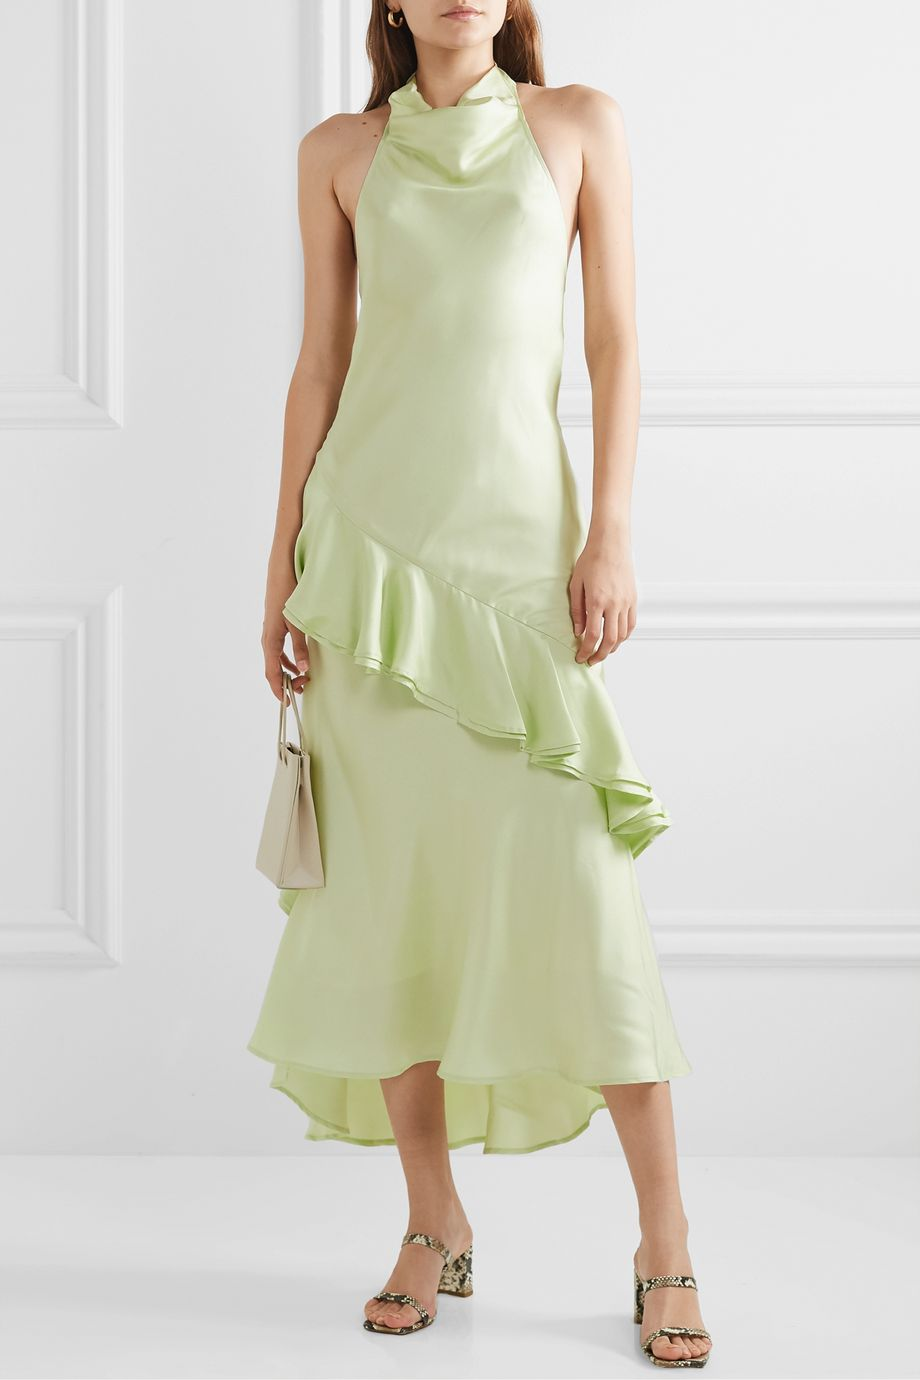 Maggie Marilyn + NET SUSTAIN Palm Springs draped ruffled silk-satin twill midi dress